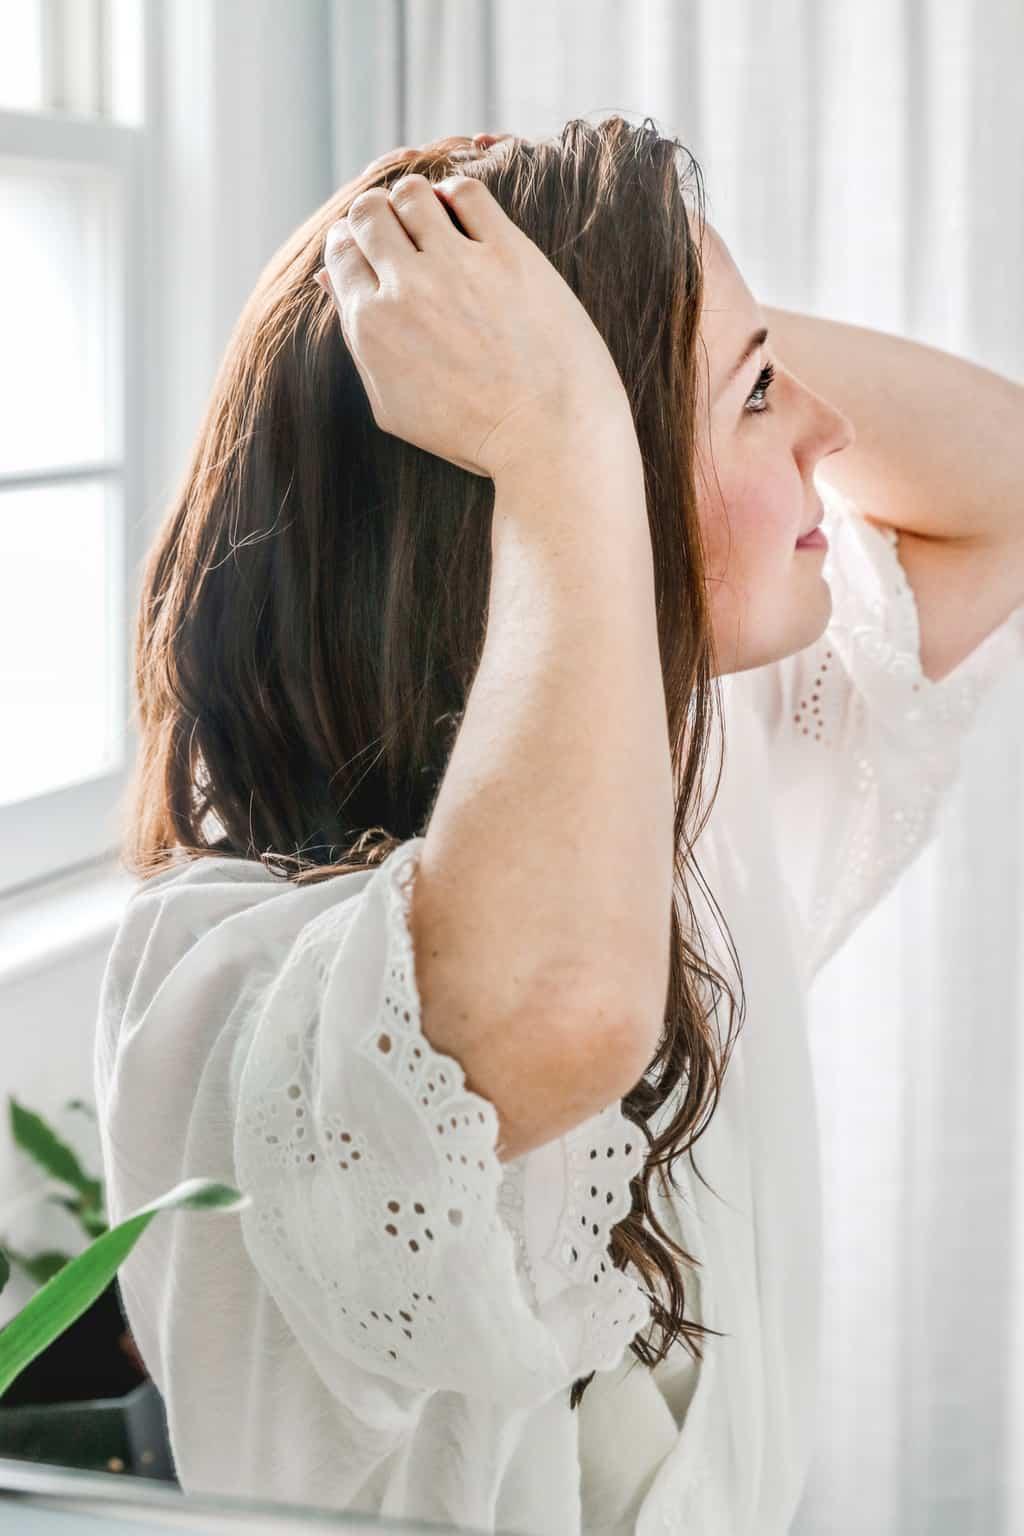 Detox Your Hair With This Apple Cider Vinegar Scalp Scrub